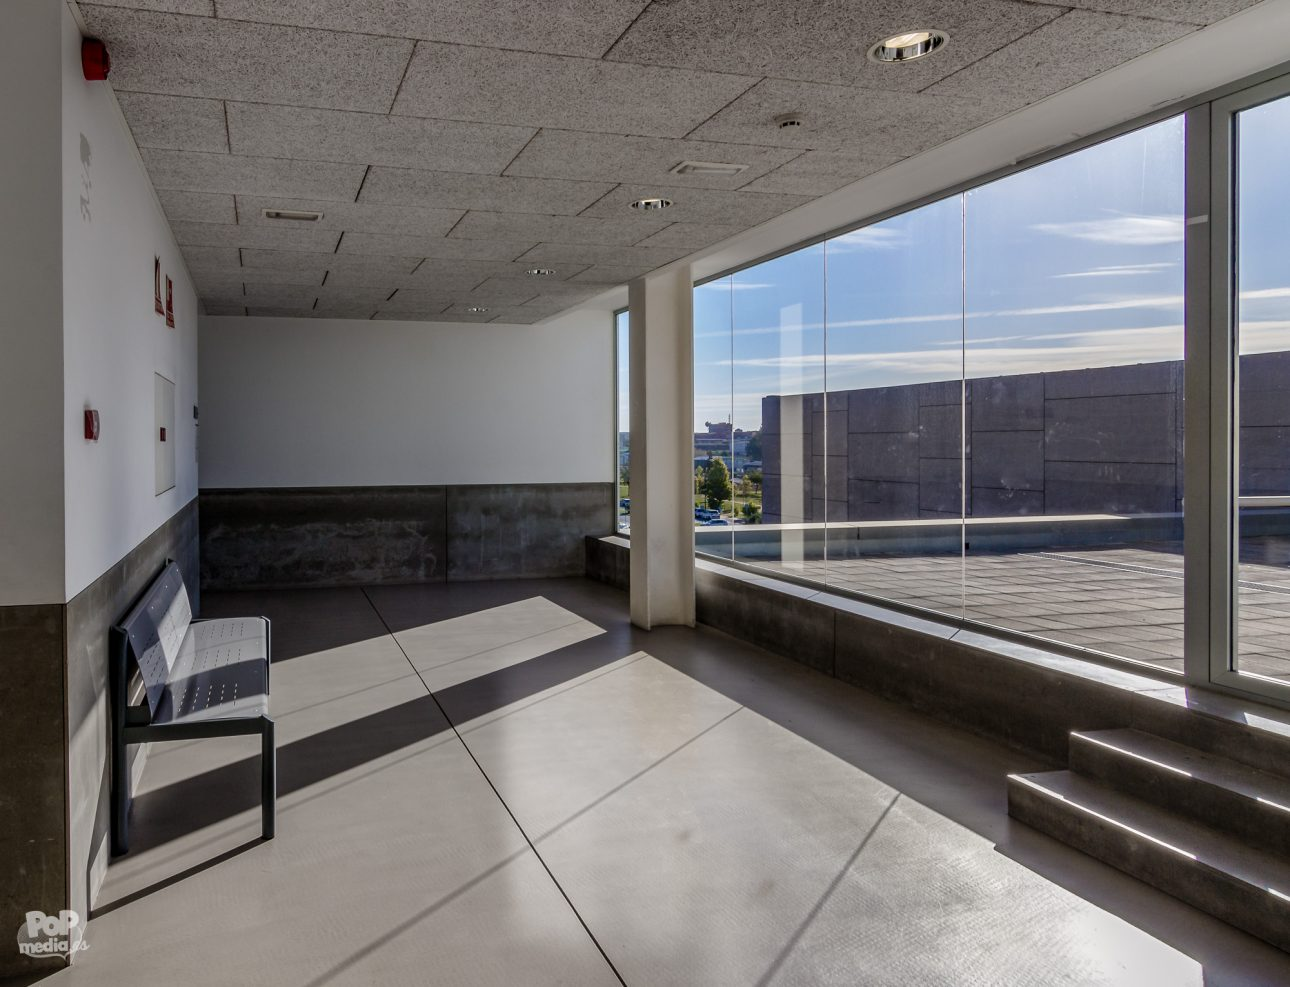 Architecture photographer in Costal del Sol   Pop-Media.es